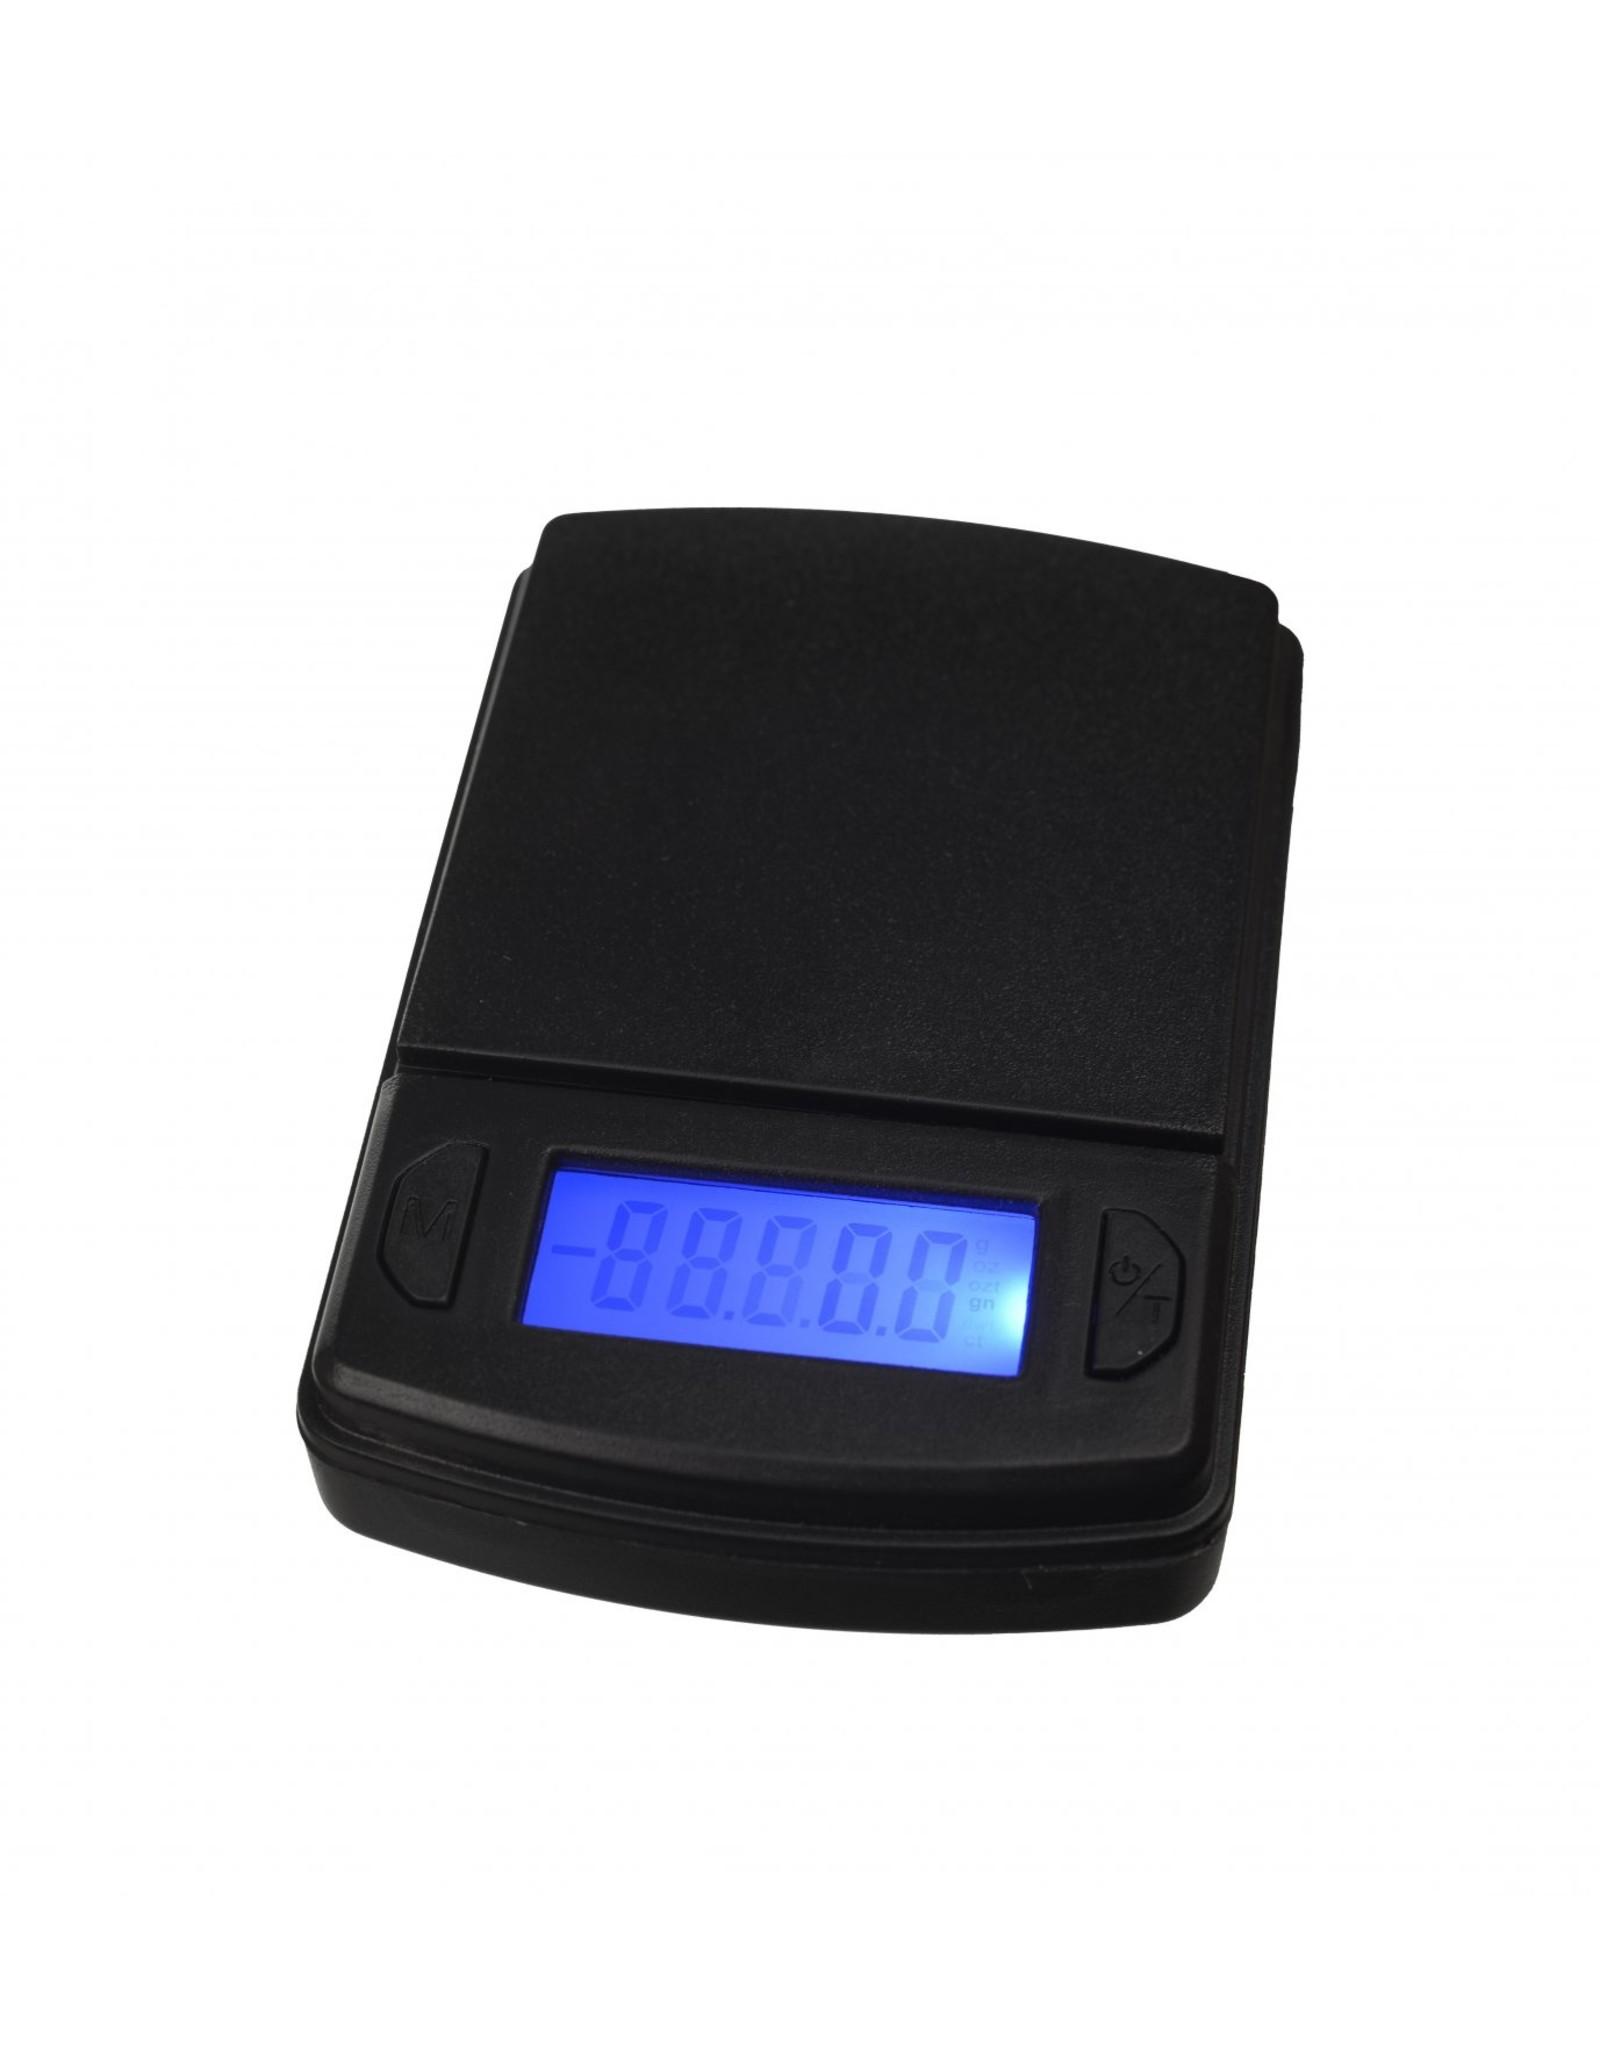 Scale Myco MM100